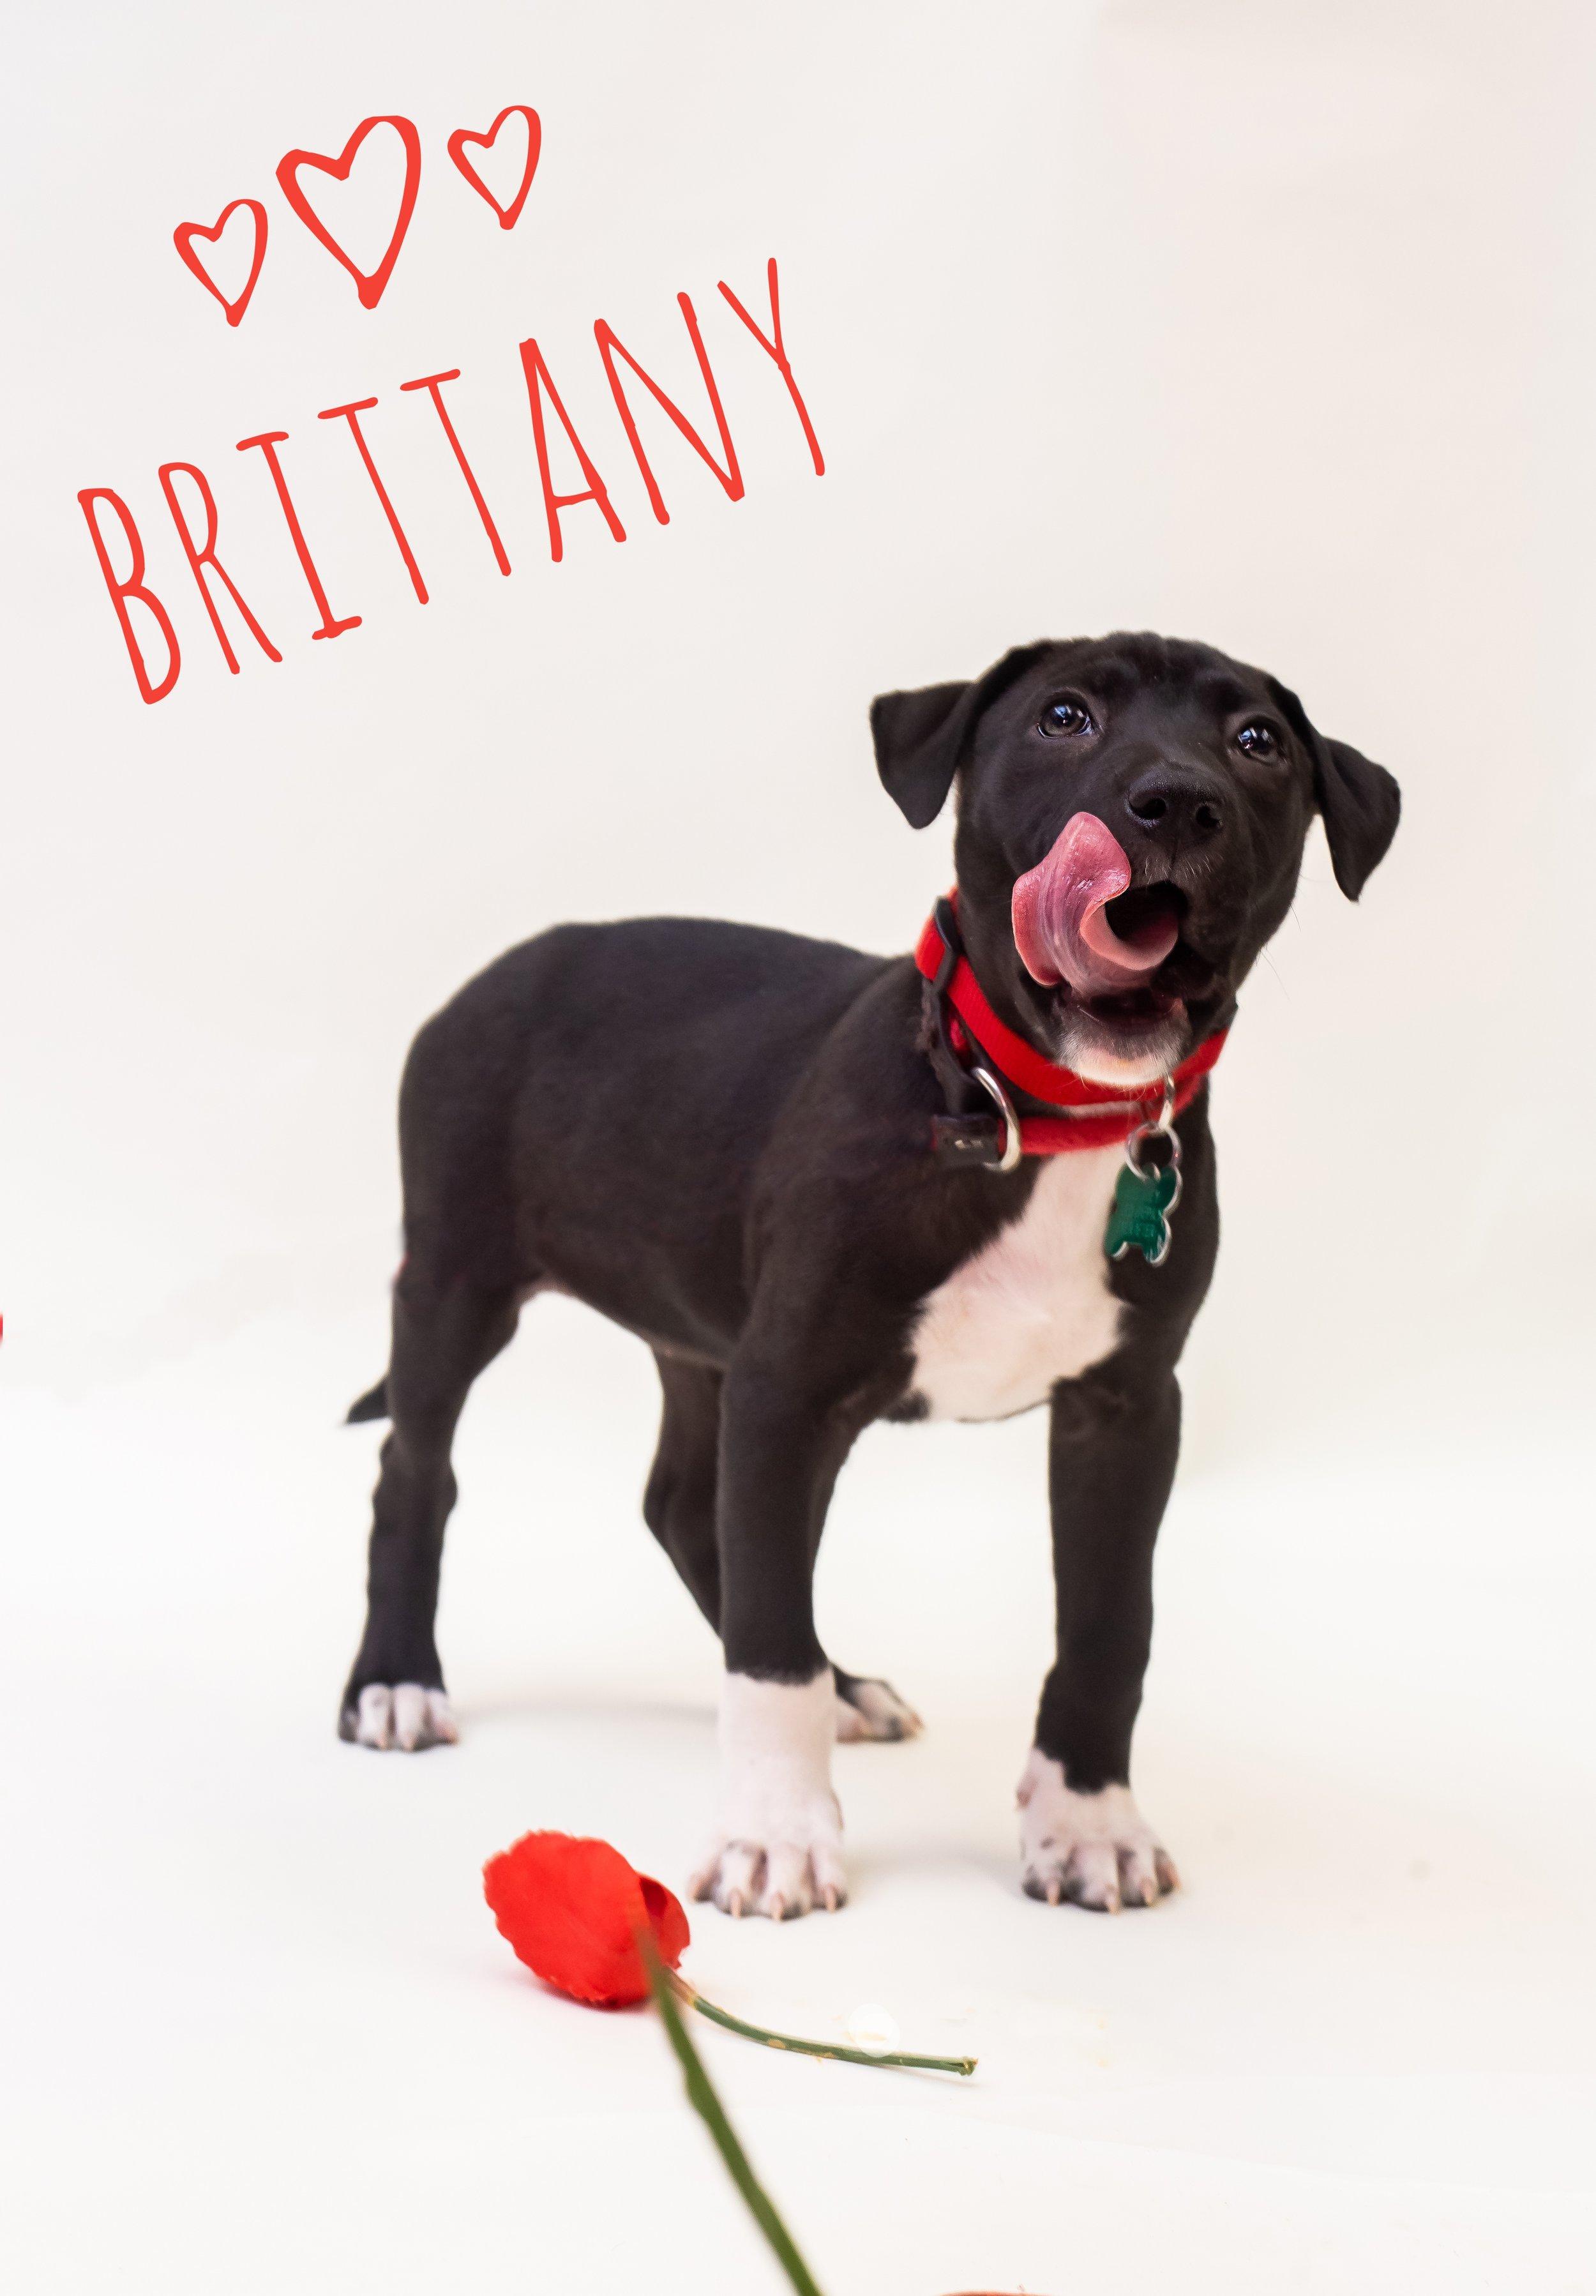 Brittany (1)-01.jpeg